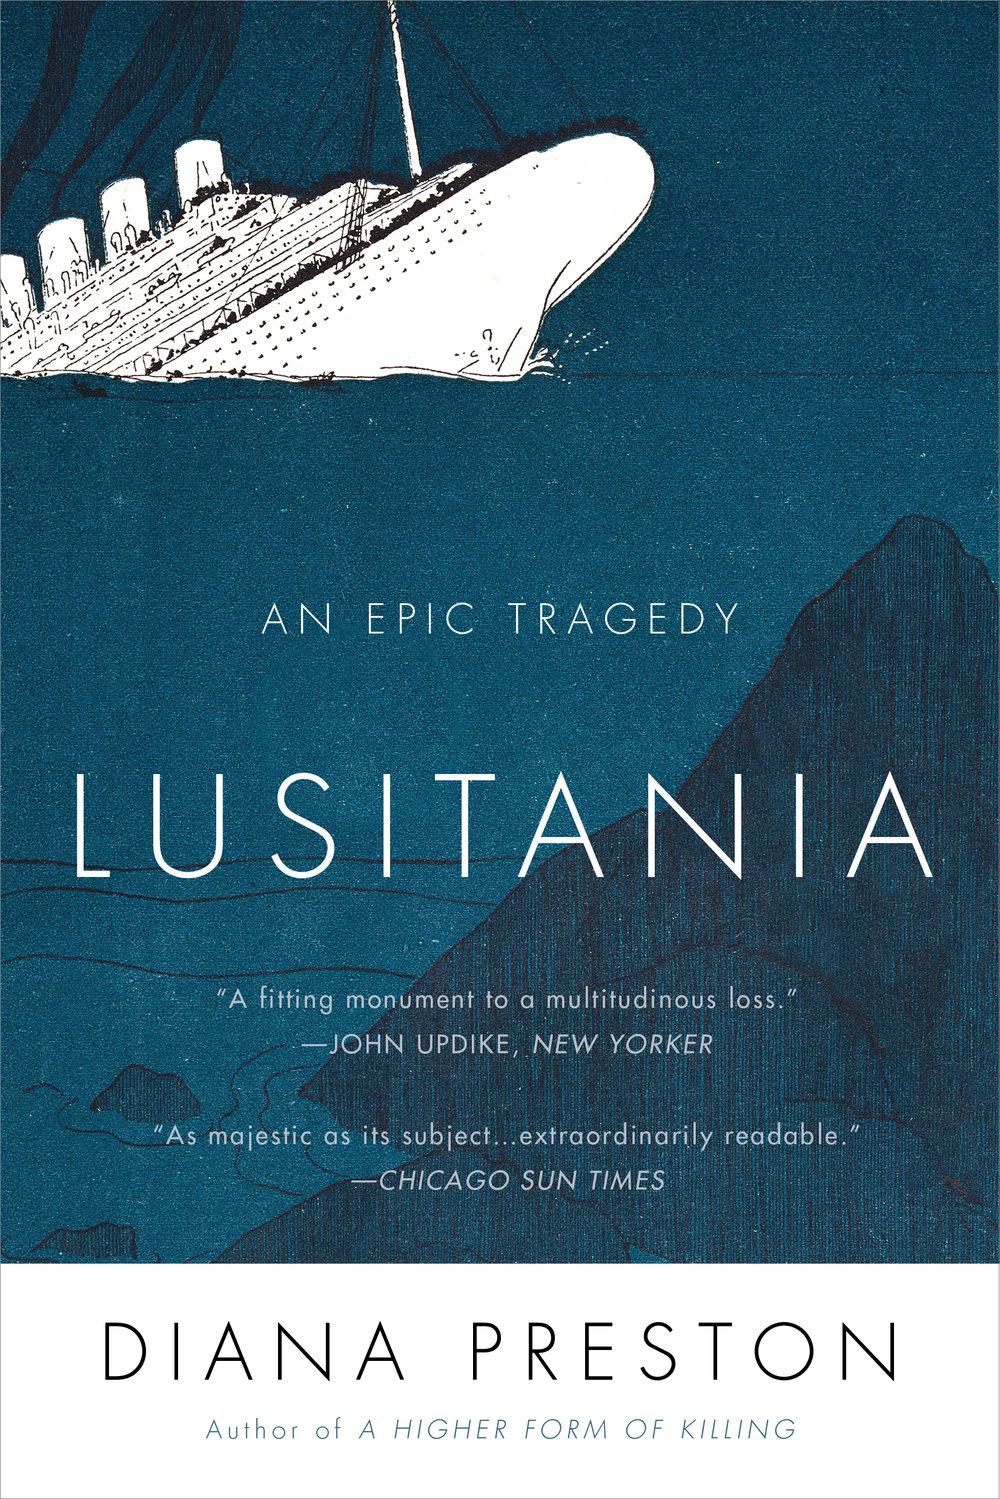 Lusitania3.jpg